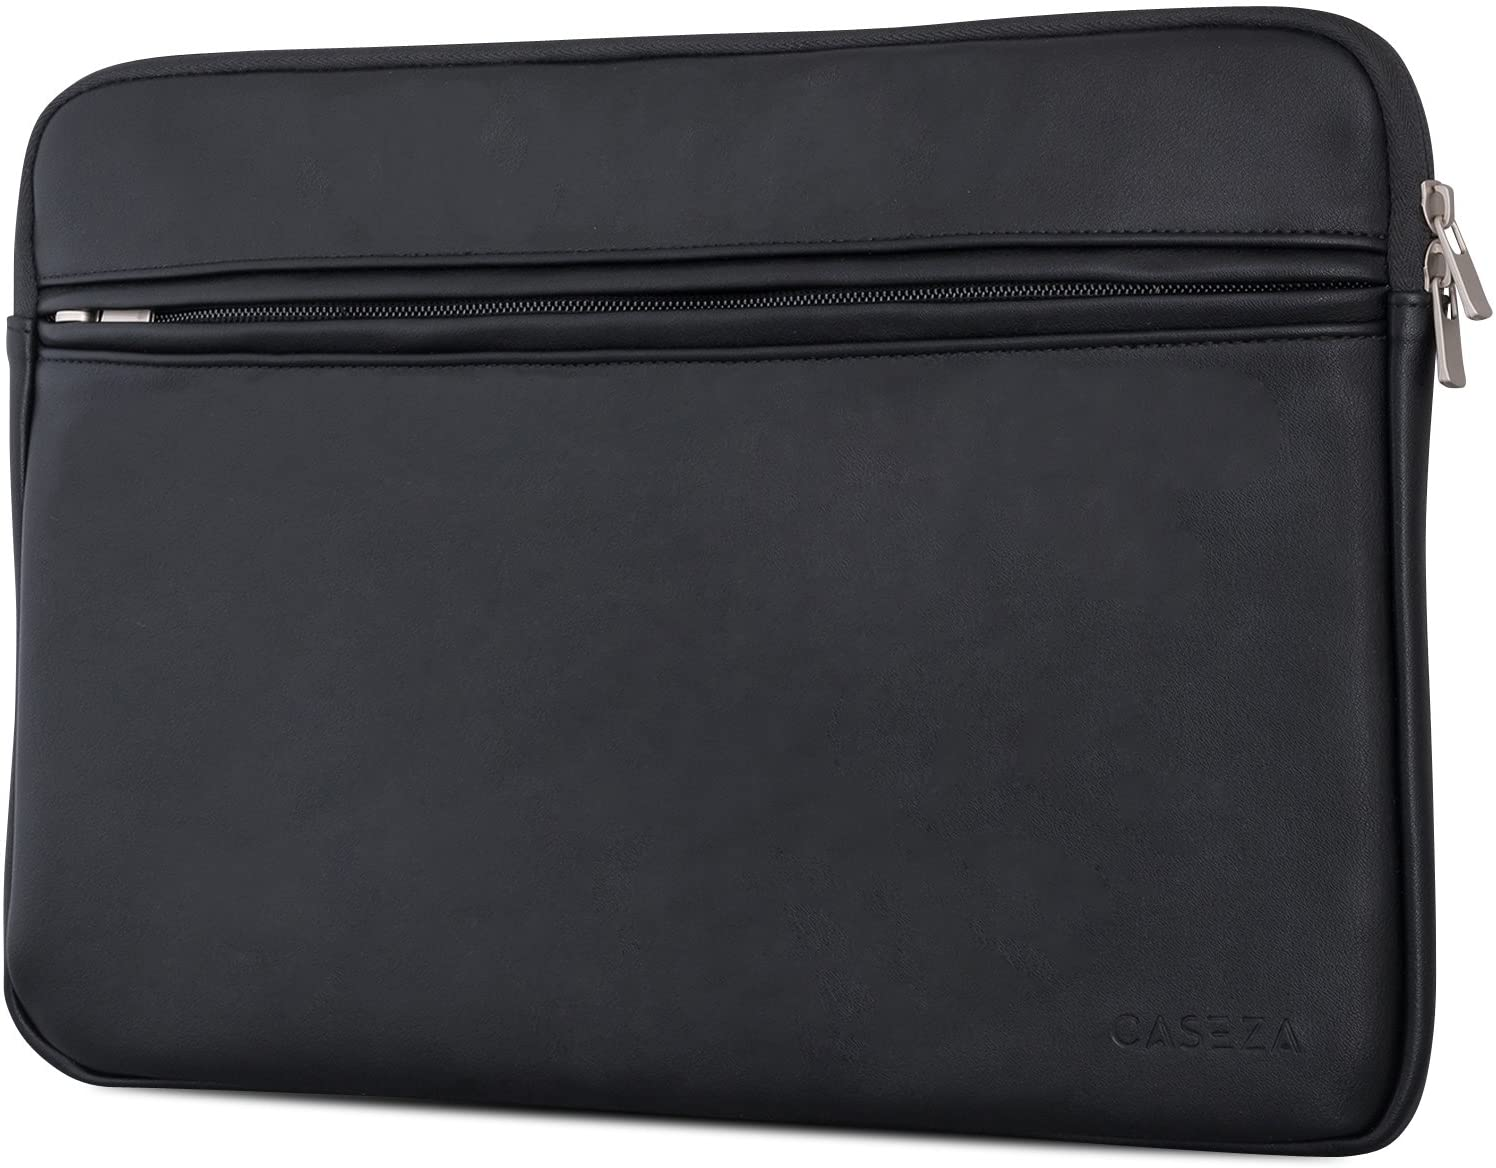 CASEZA Boston MacBook 12